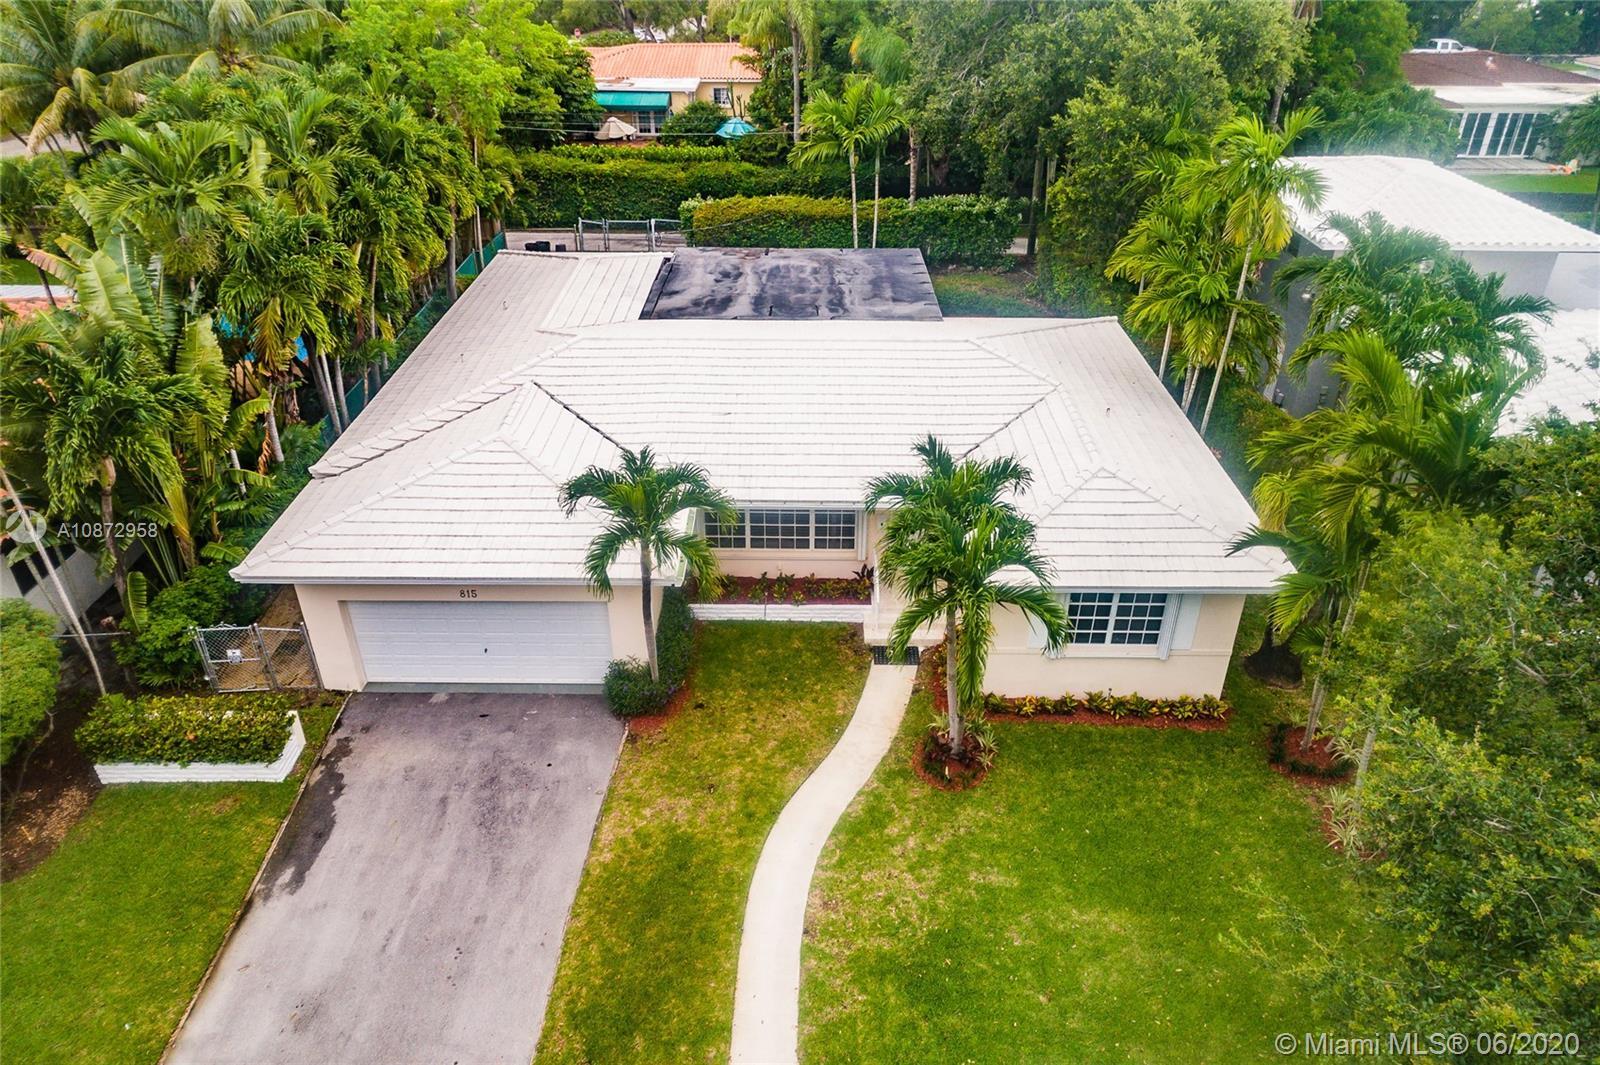 Miami Shores # - 39 - photo